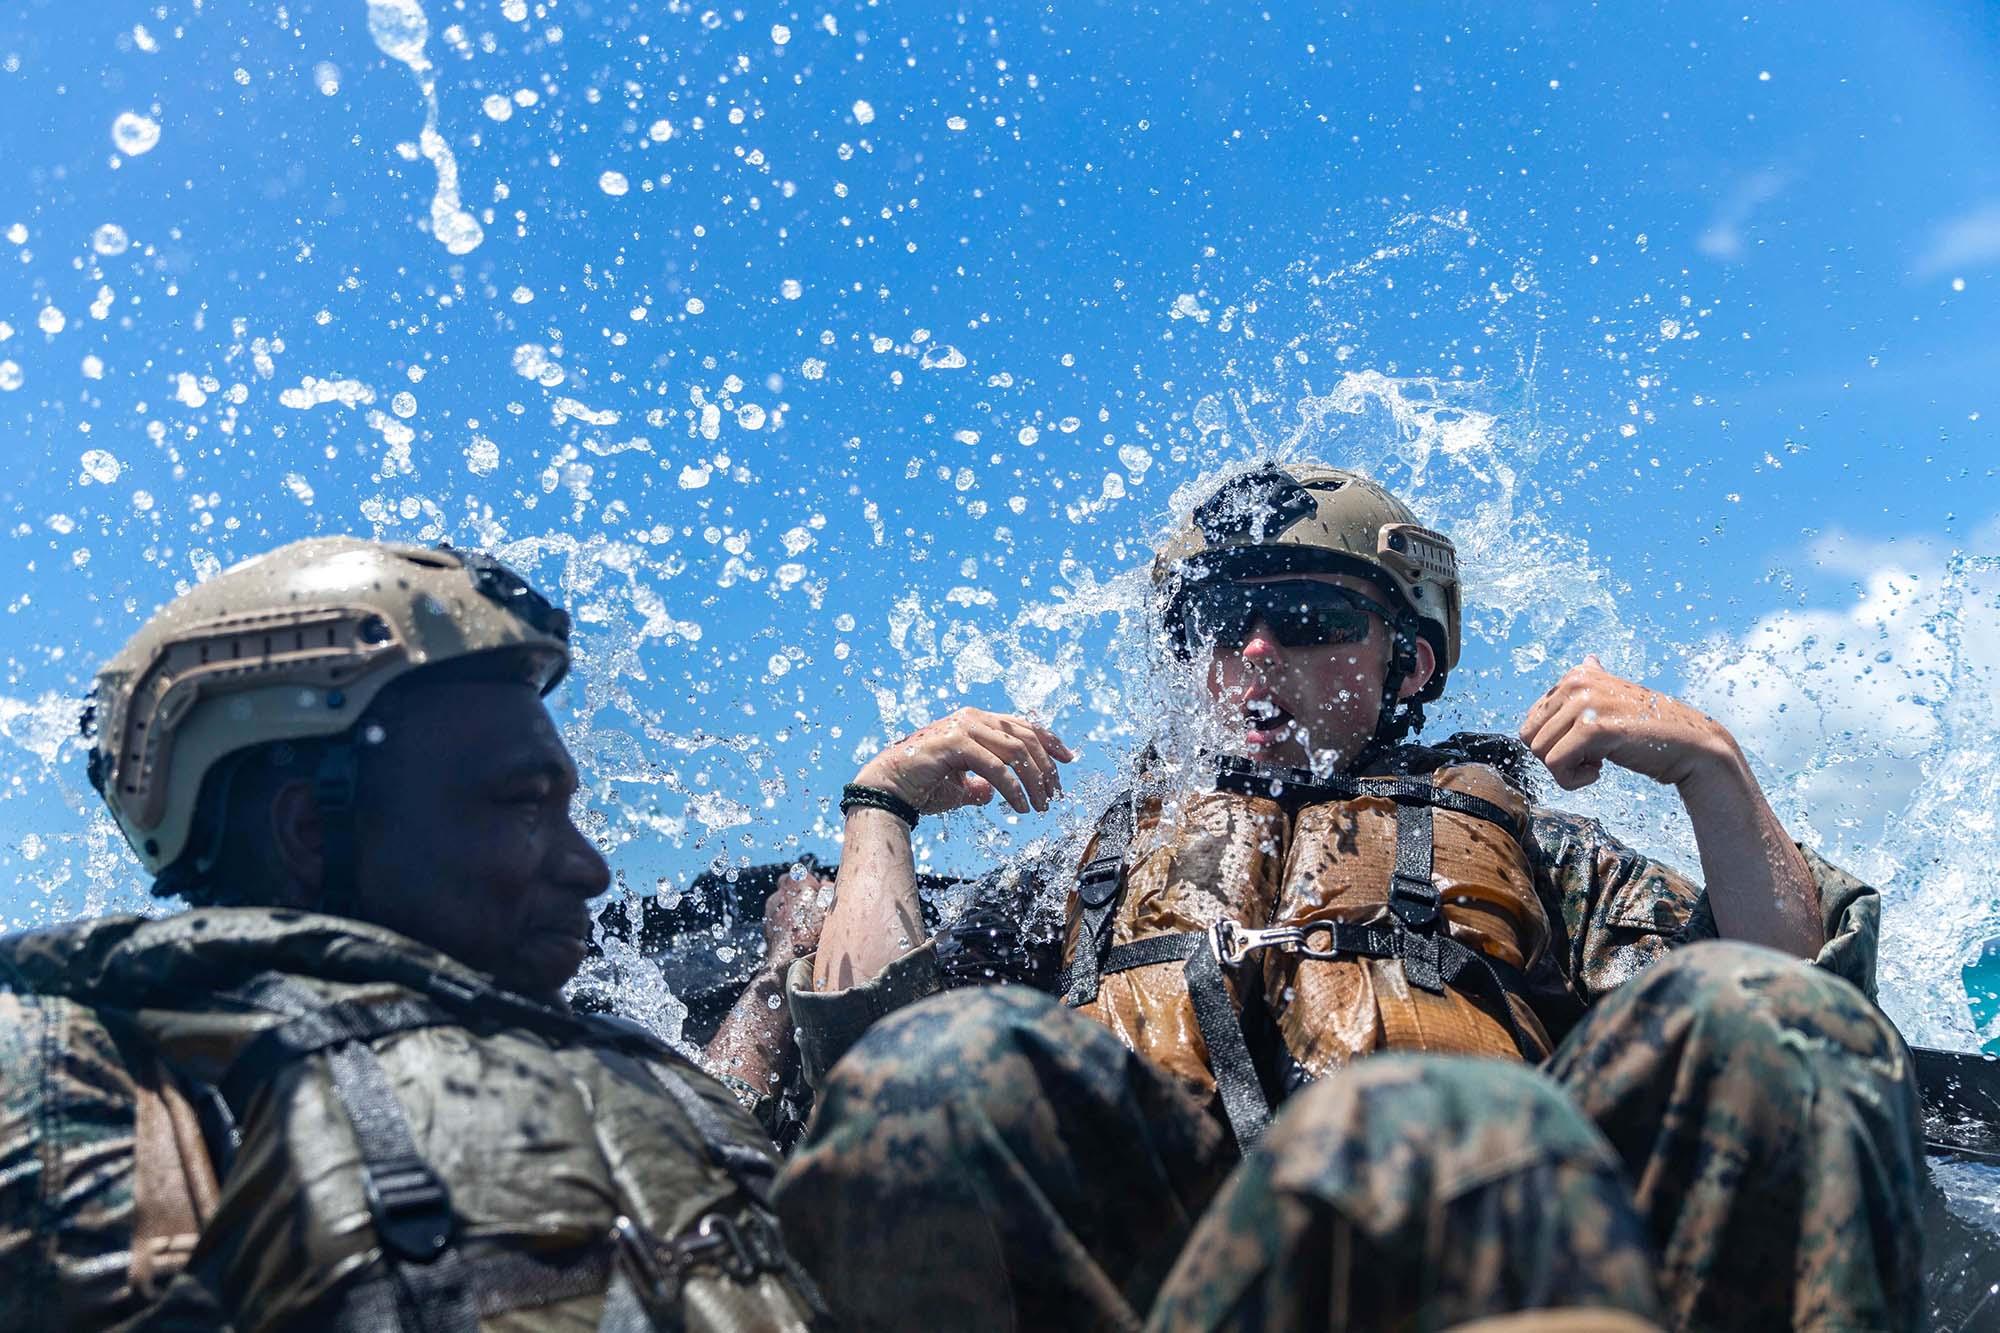 U.S. Marines execute amphibious raid rehearsals in a combat rubber raiding craft at Kin Blue training area, Okinawa, Japan, May 14, 2021. (Lance Cpl. Grace Gerlach/Marine Corps)